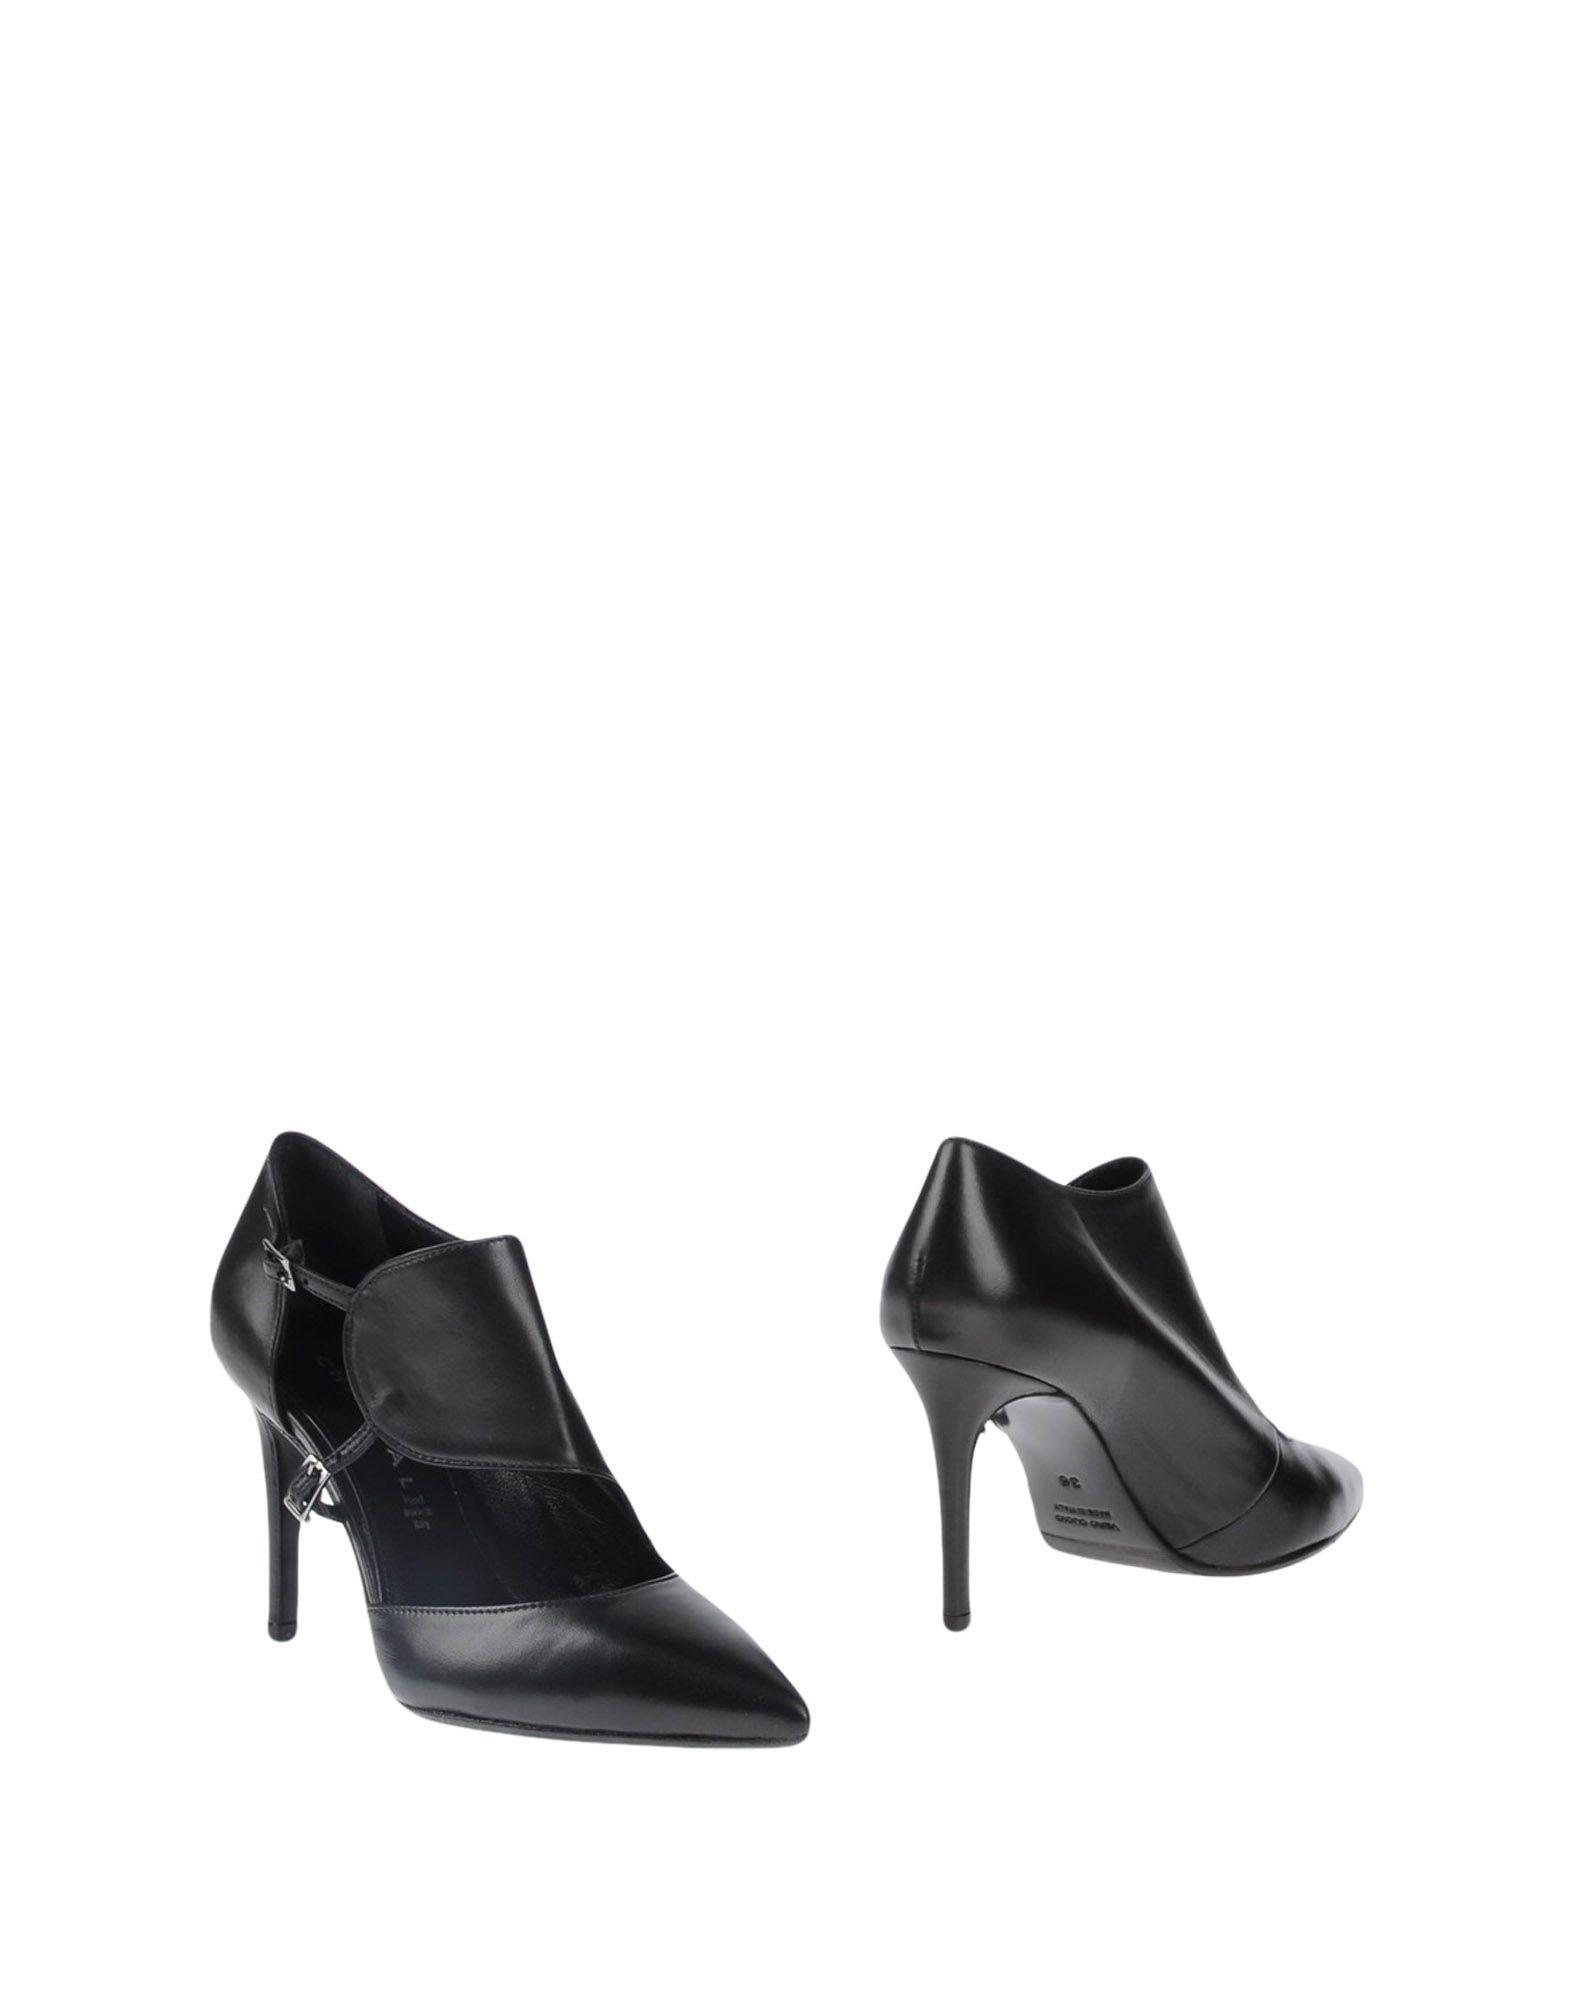 Chantal Stiefelette Damen  11041868OG Gute Qualität beliebte Schuhe